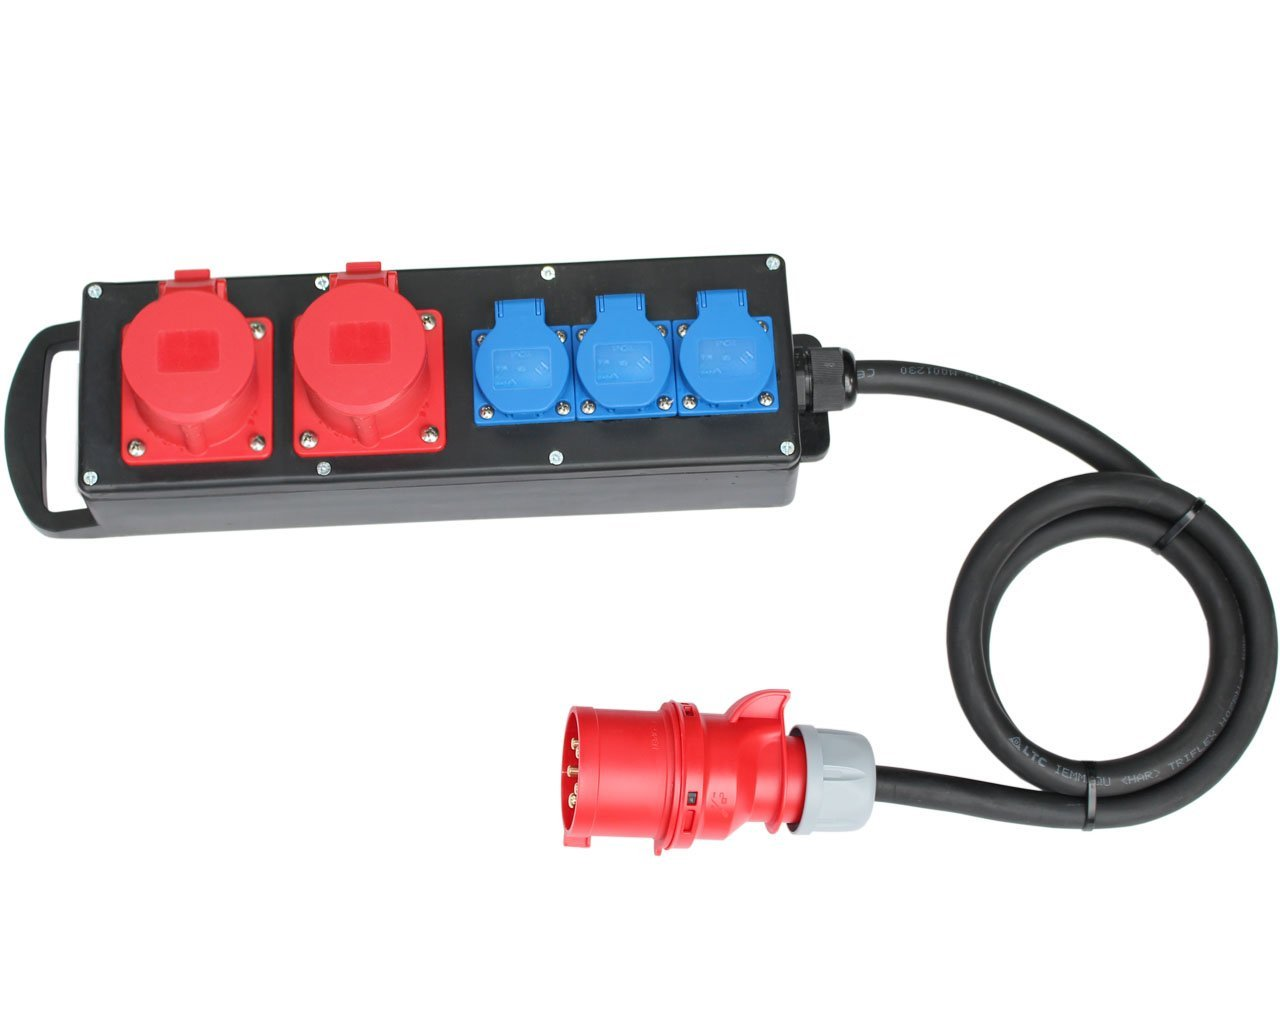 400V zu 2x16A 3x230V Vollgummi Verteiler Baustromverteiler CEE Stromverteiler 16A